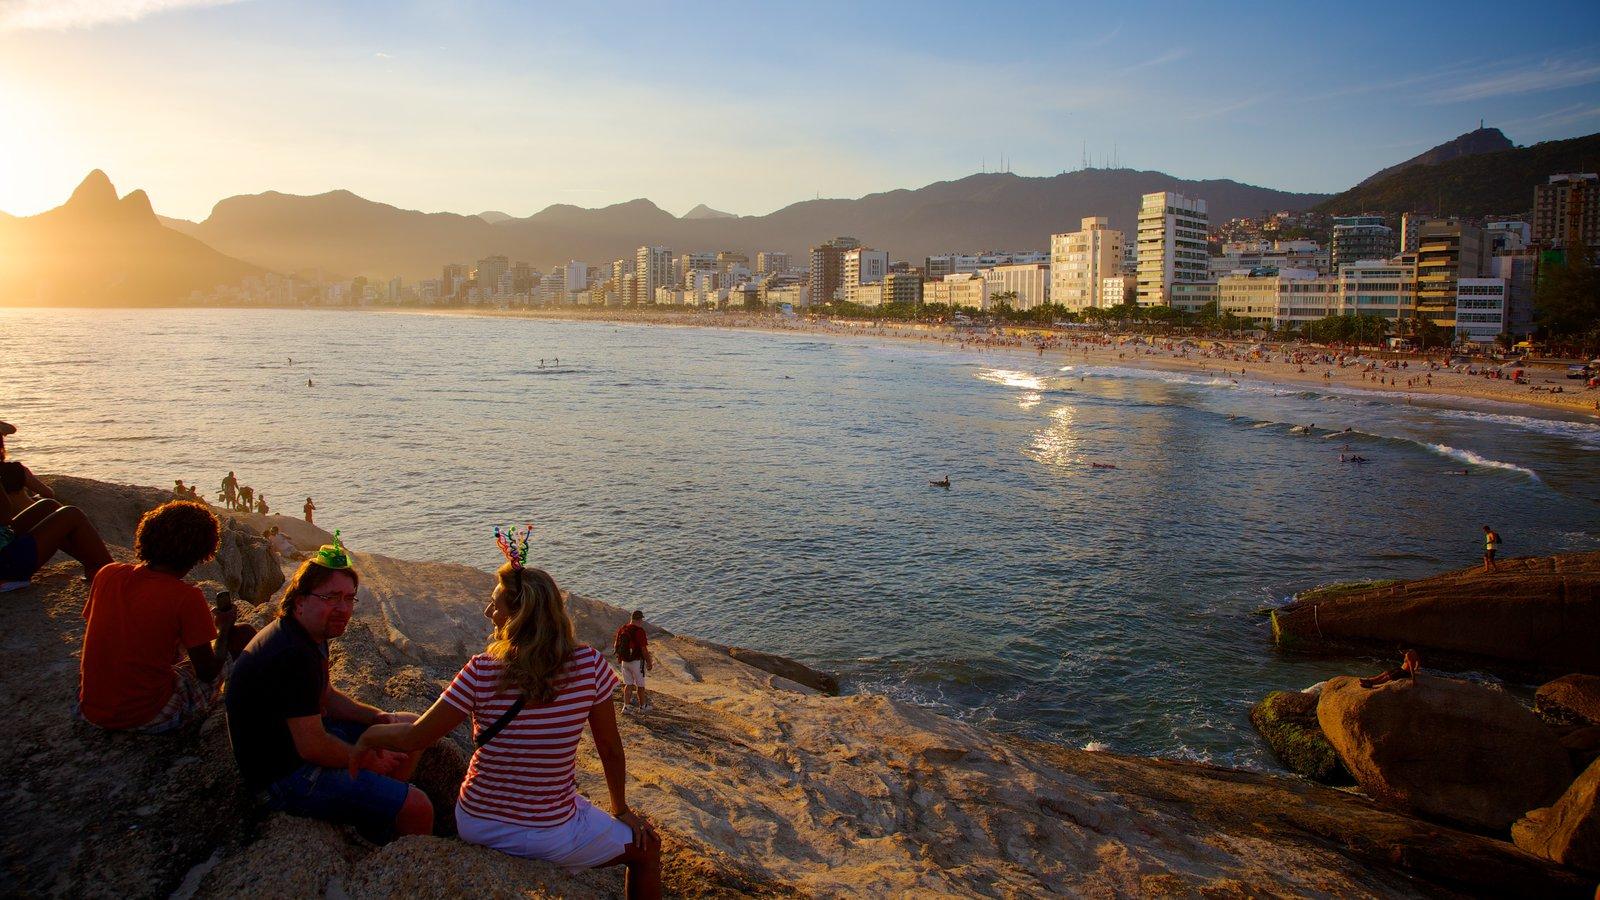 Rio de Janeiro showing a sunset